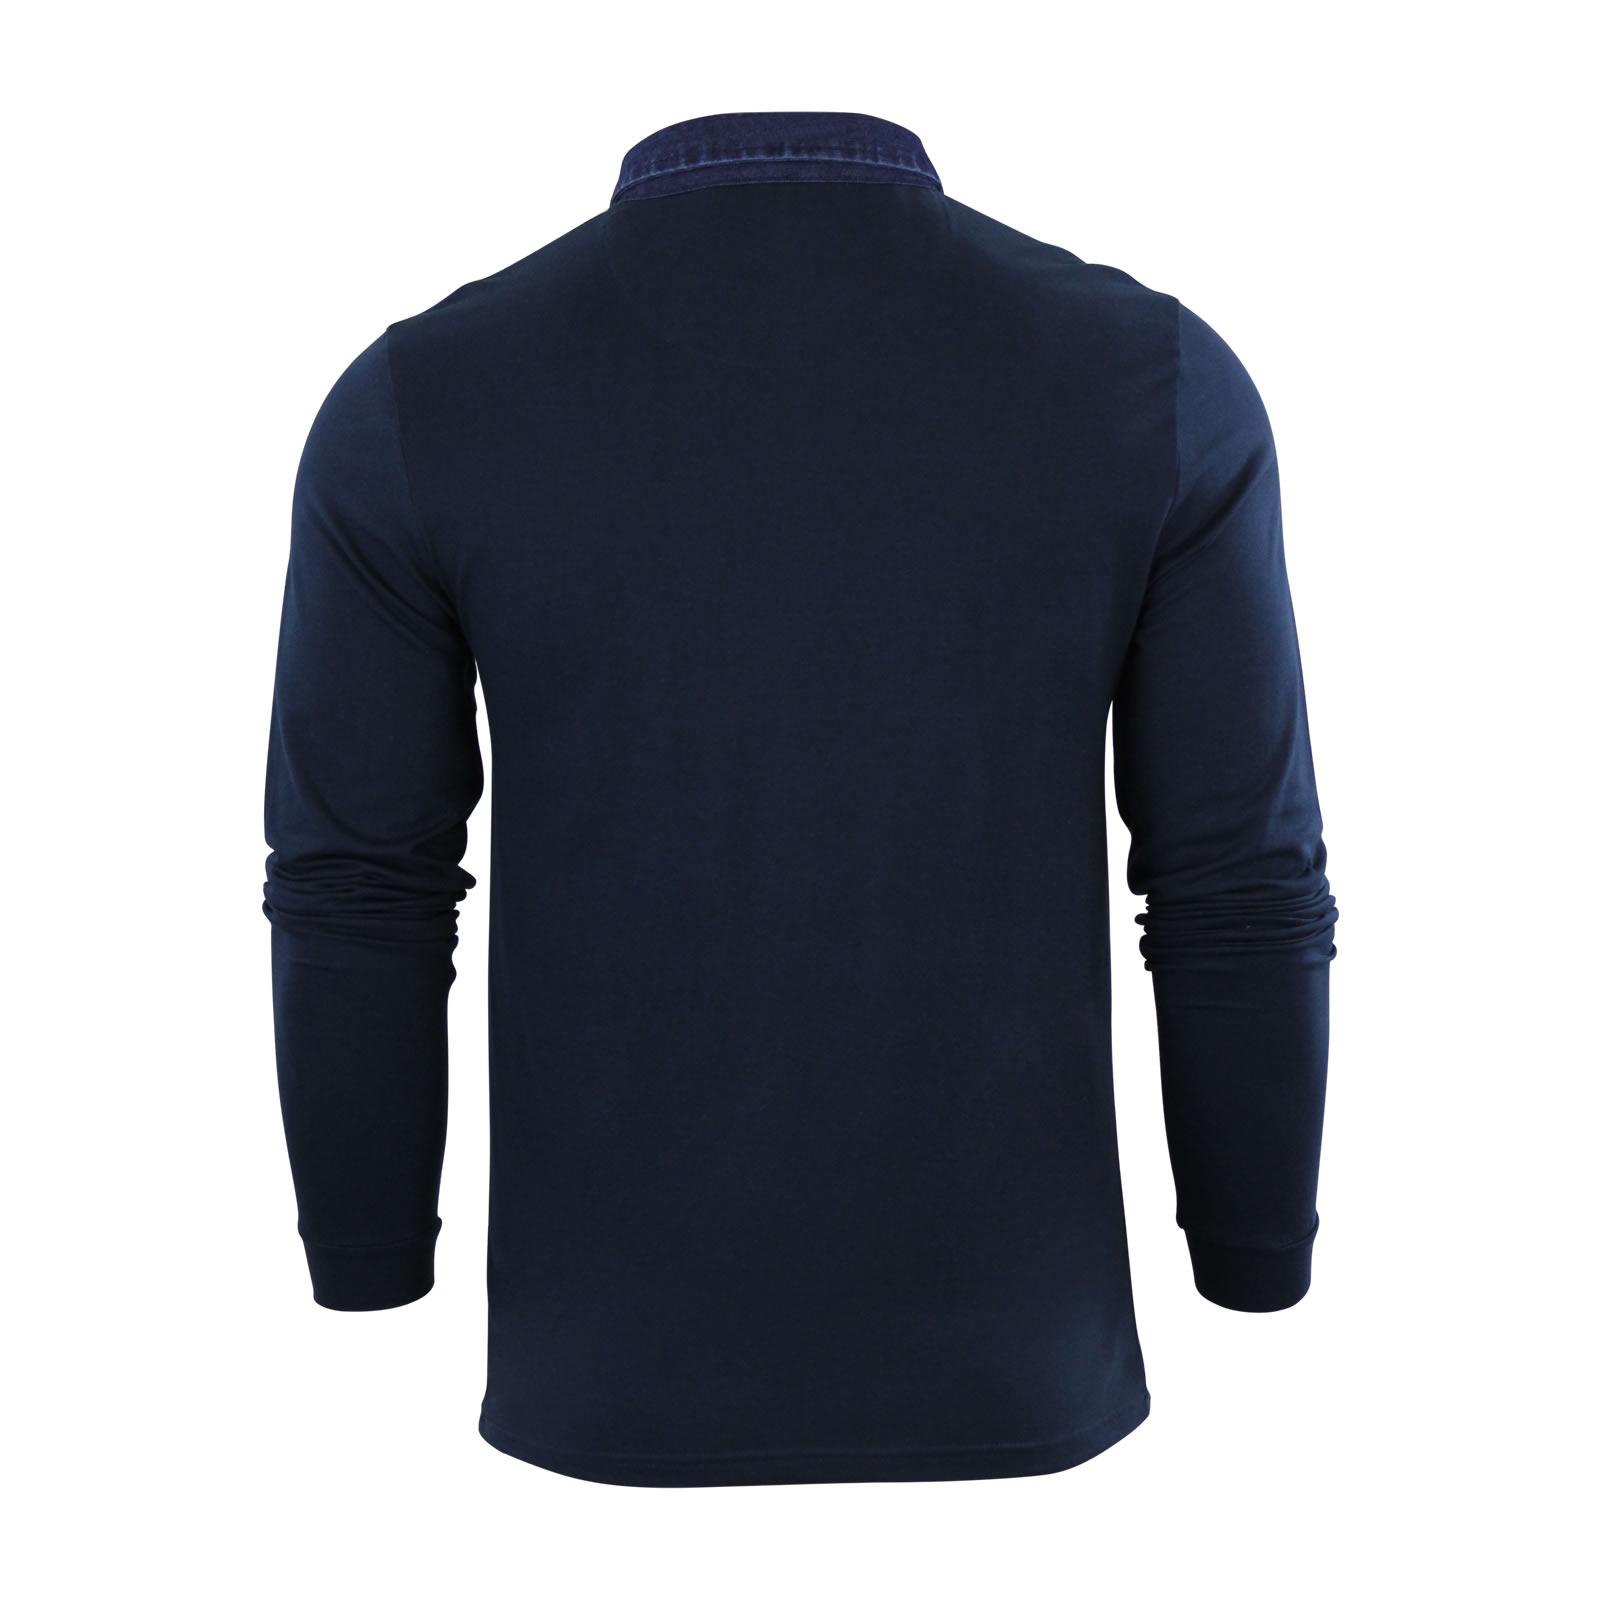 Mens-Polo-T-Shirt-Brave-Soul-Gospel-Denim-Collared-Long-Sleeve-Casual-Top thumbnail 6